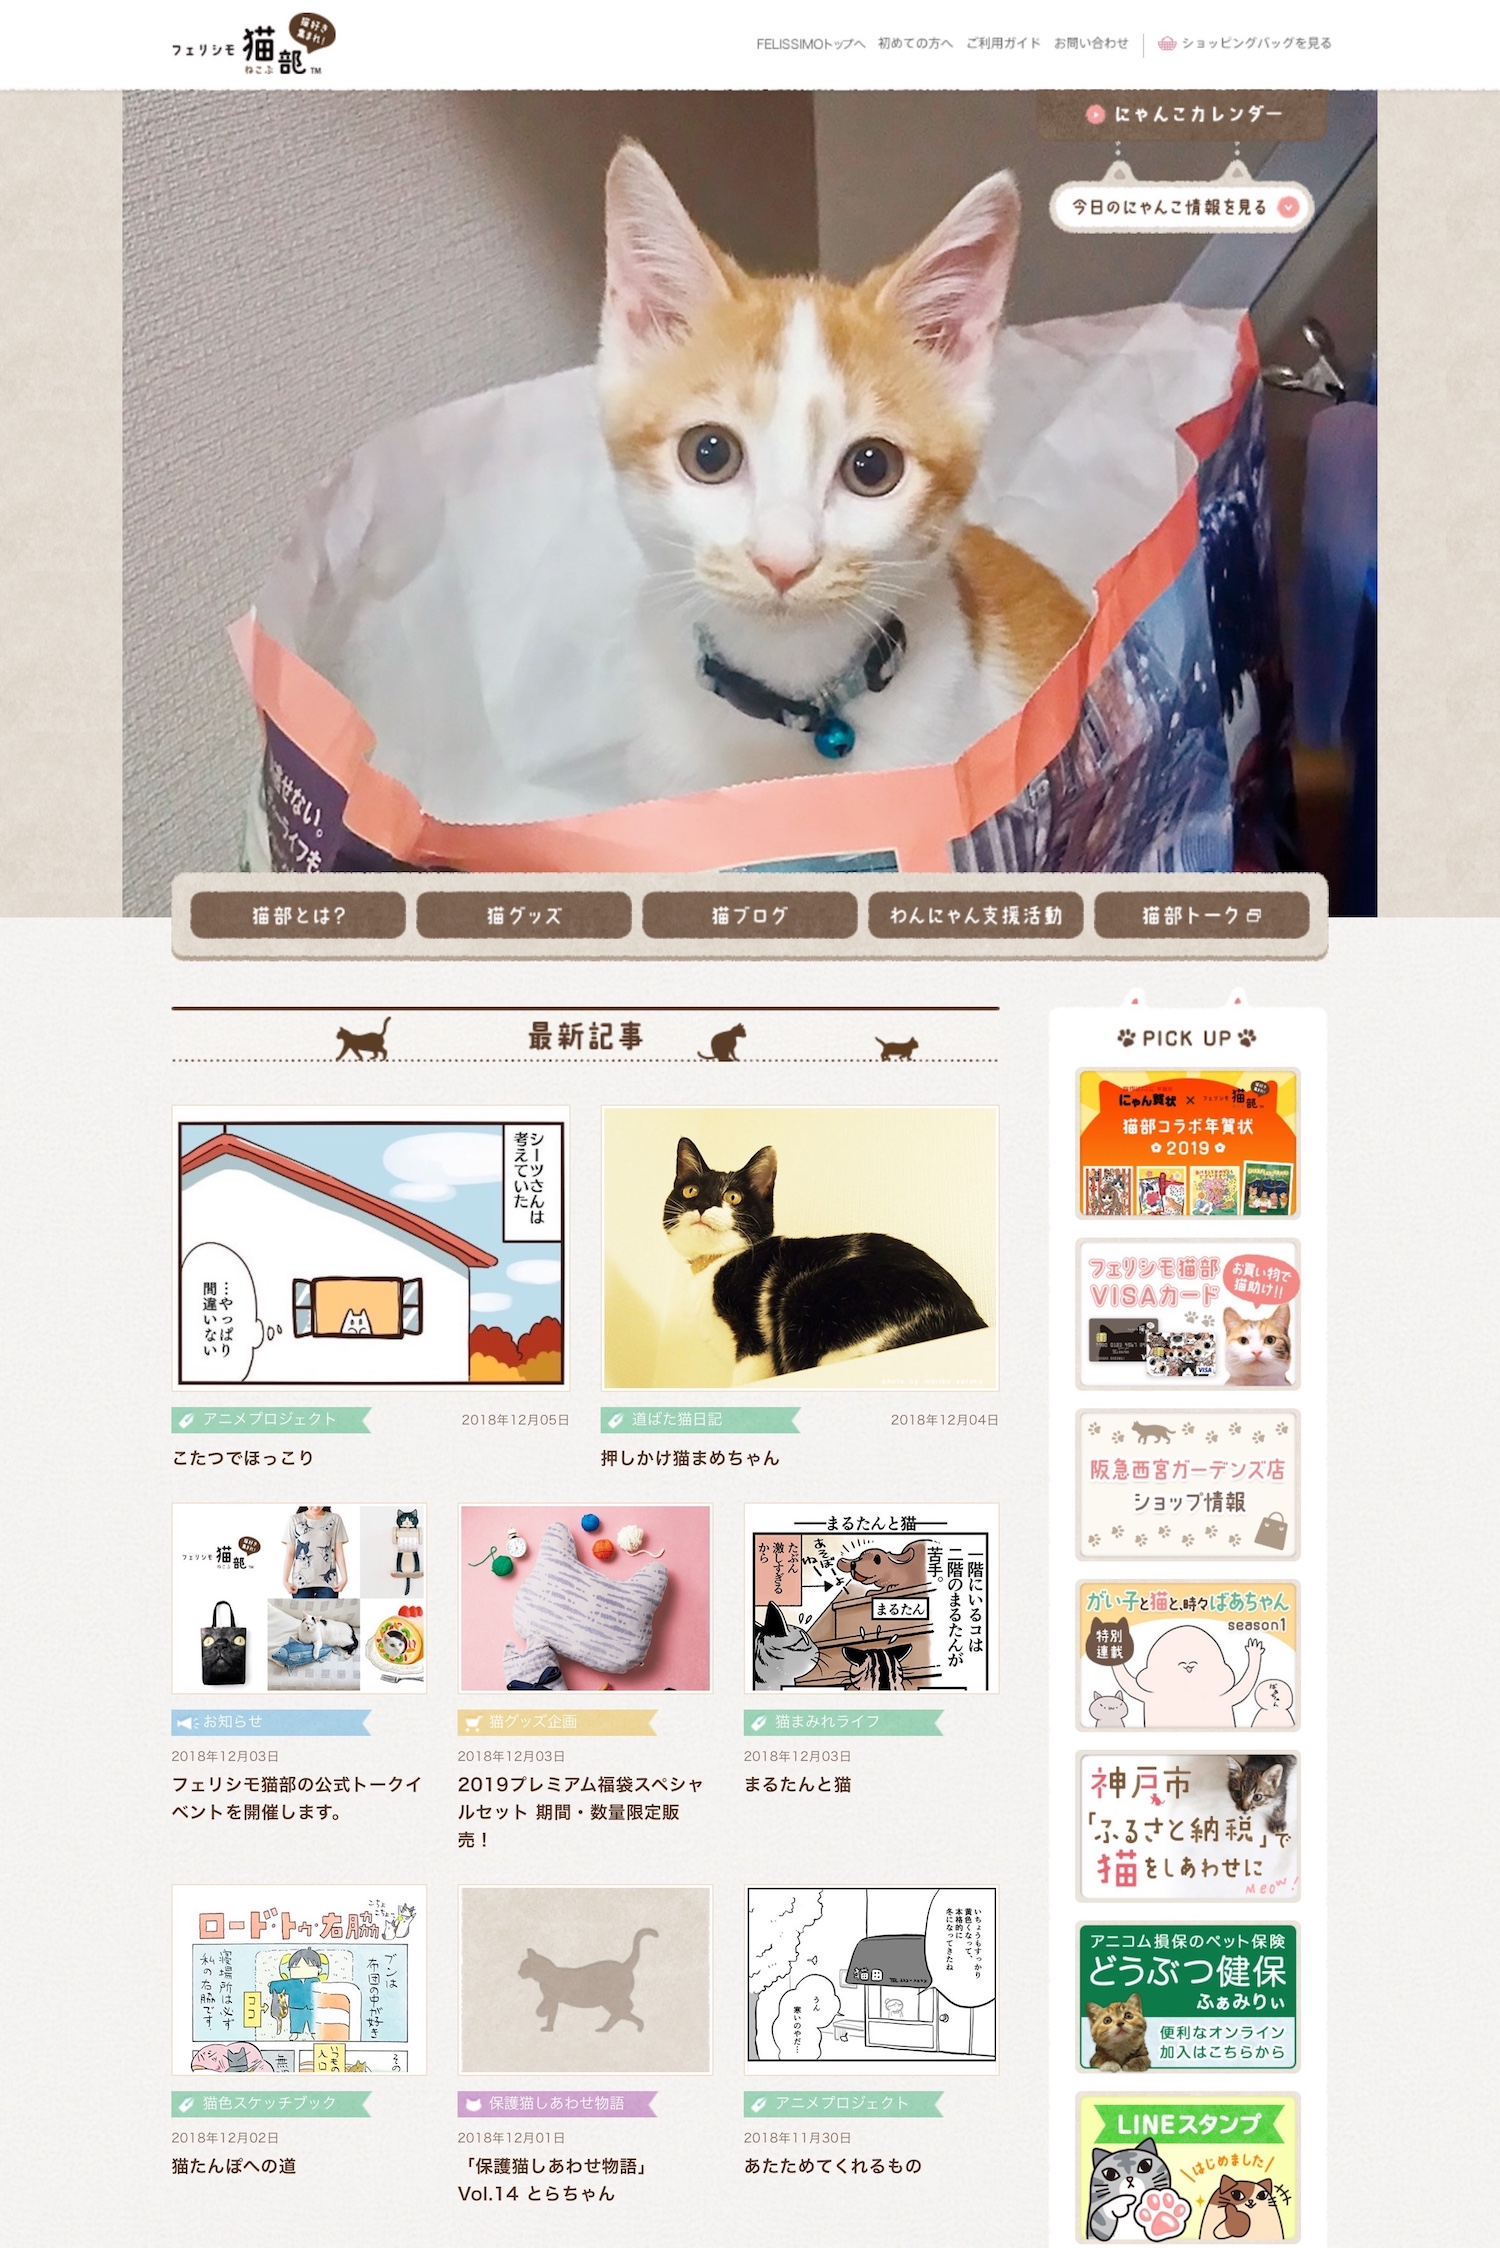 19.Wp 猫部1.JPG